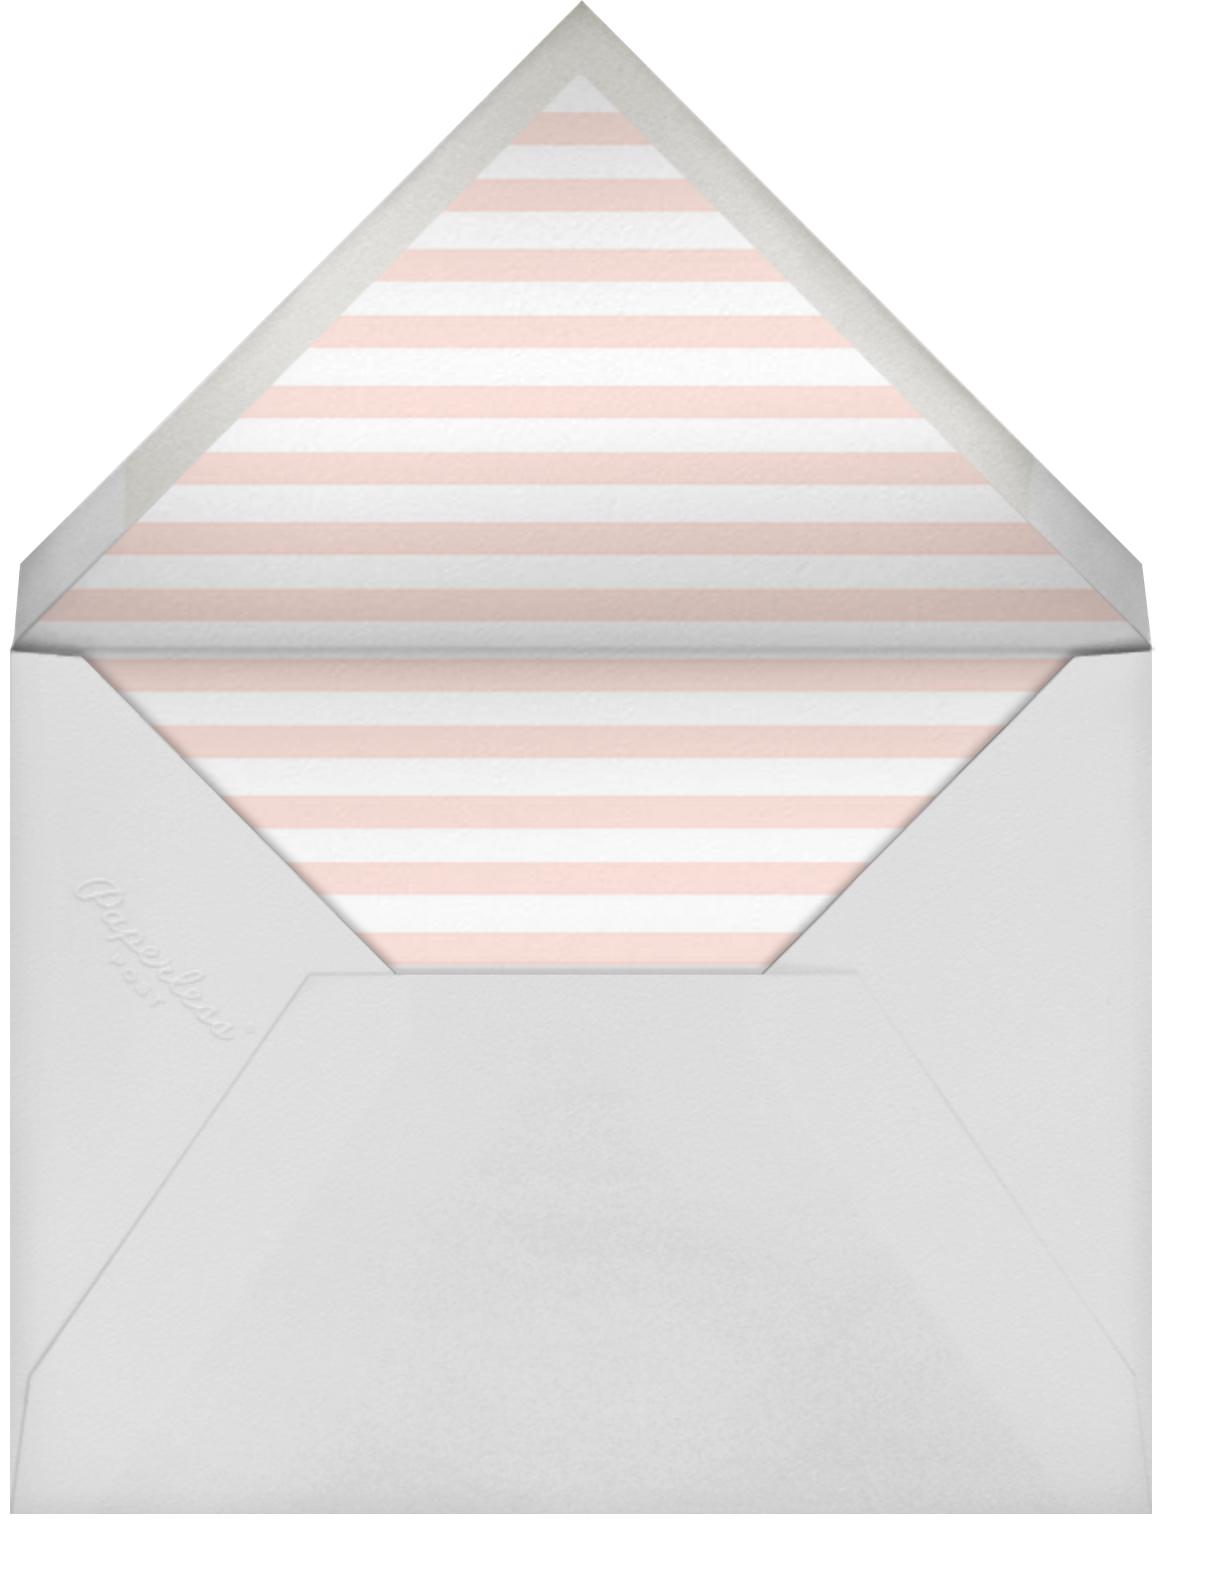 Balloon Birthday (Photo) - Pink - kate spade new york - Kids' birthday - envelope back